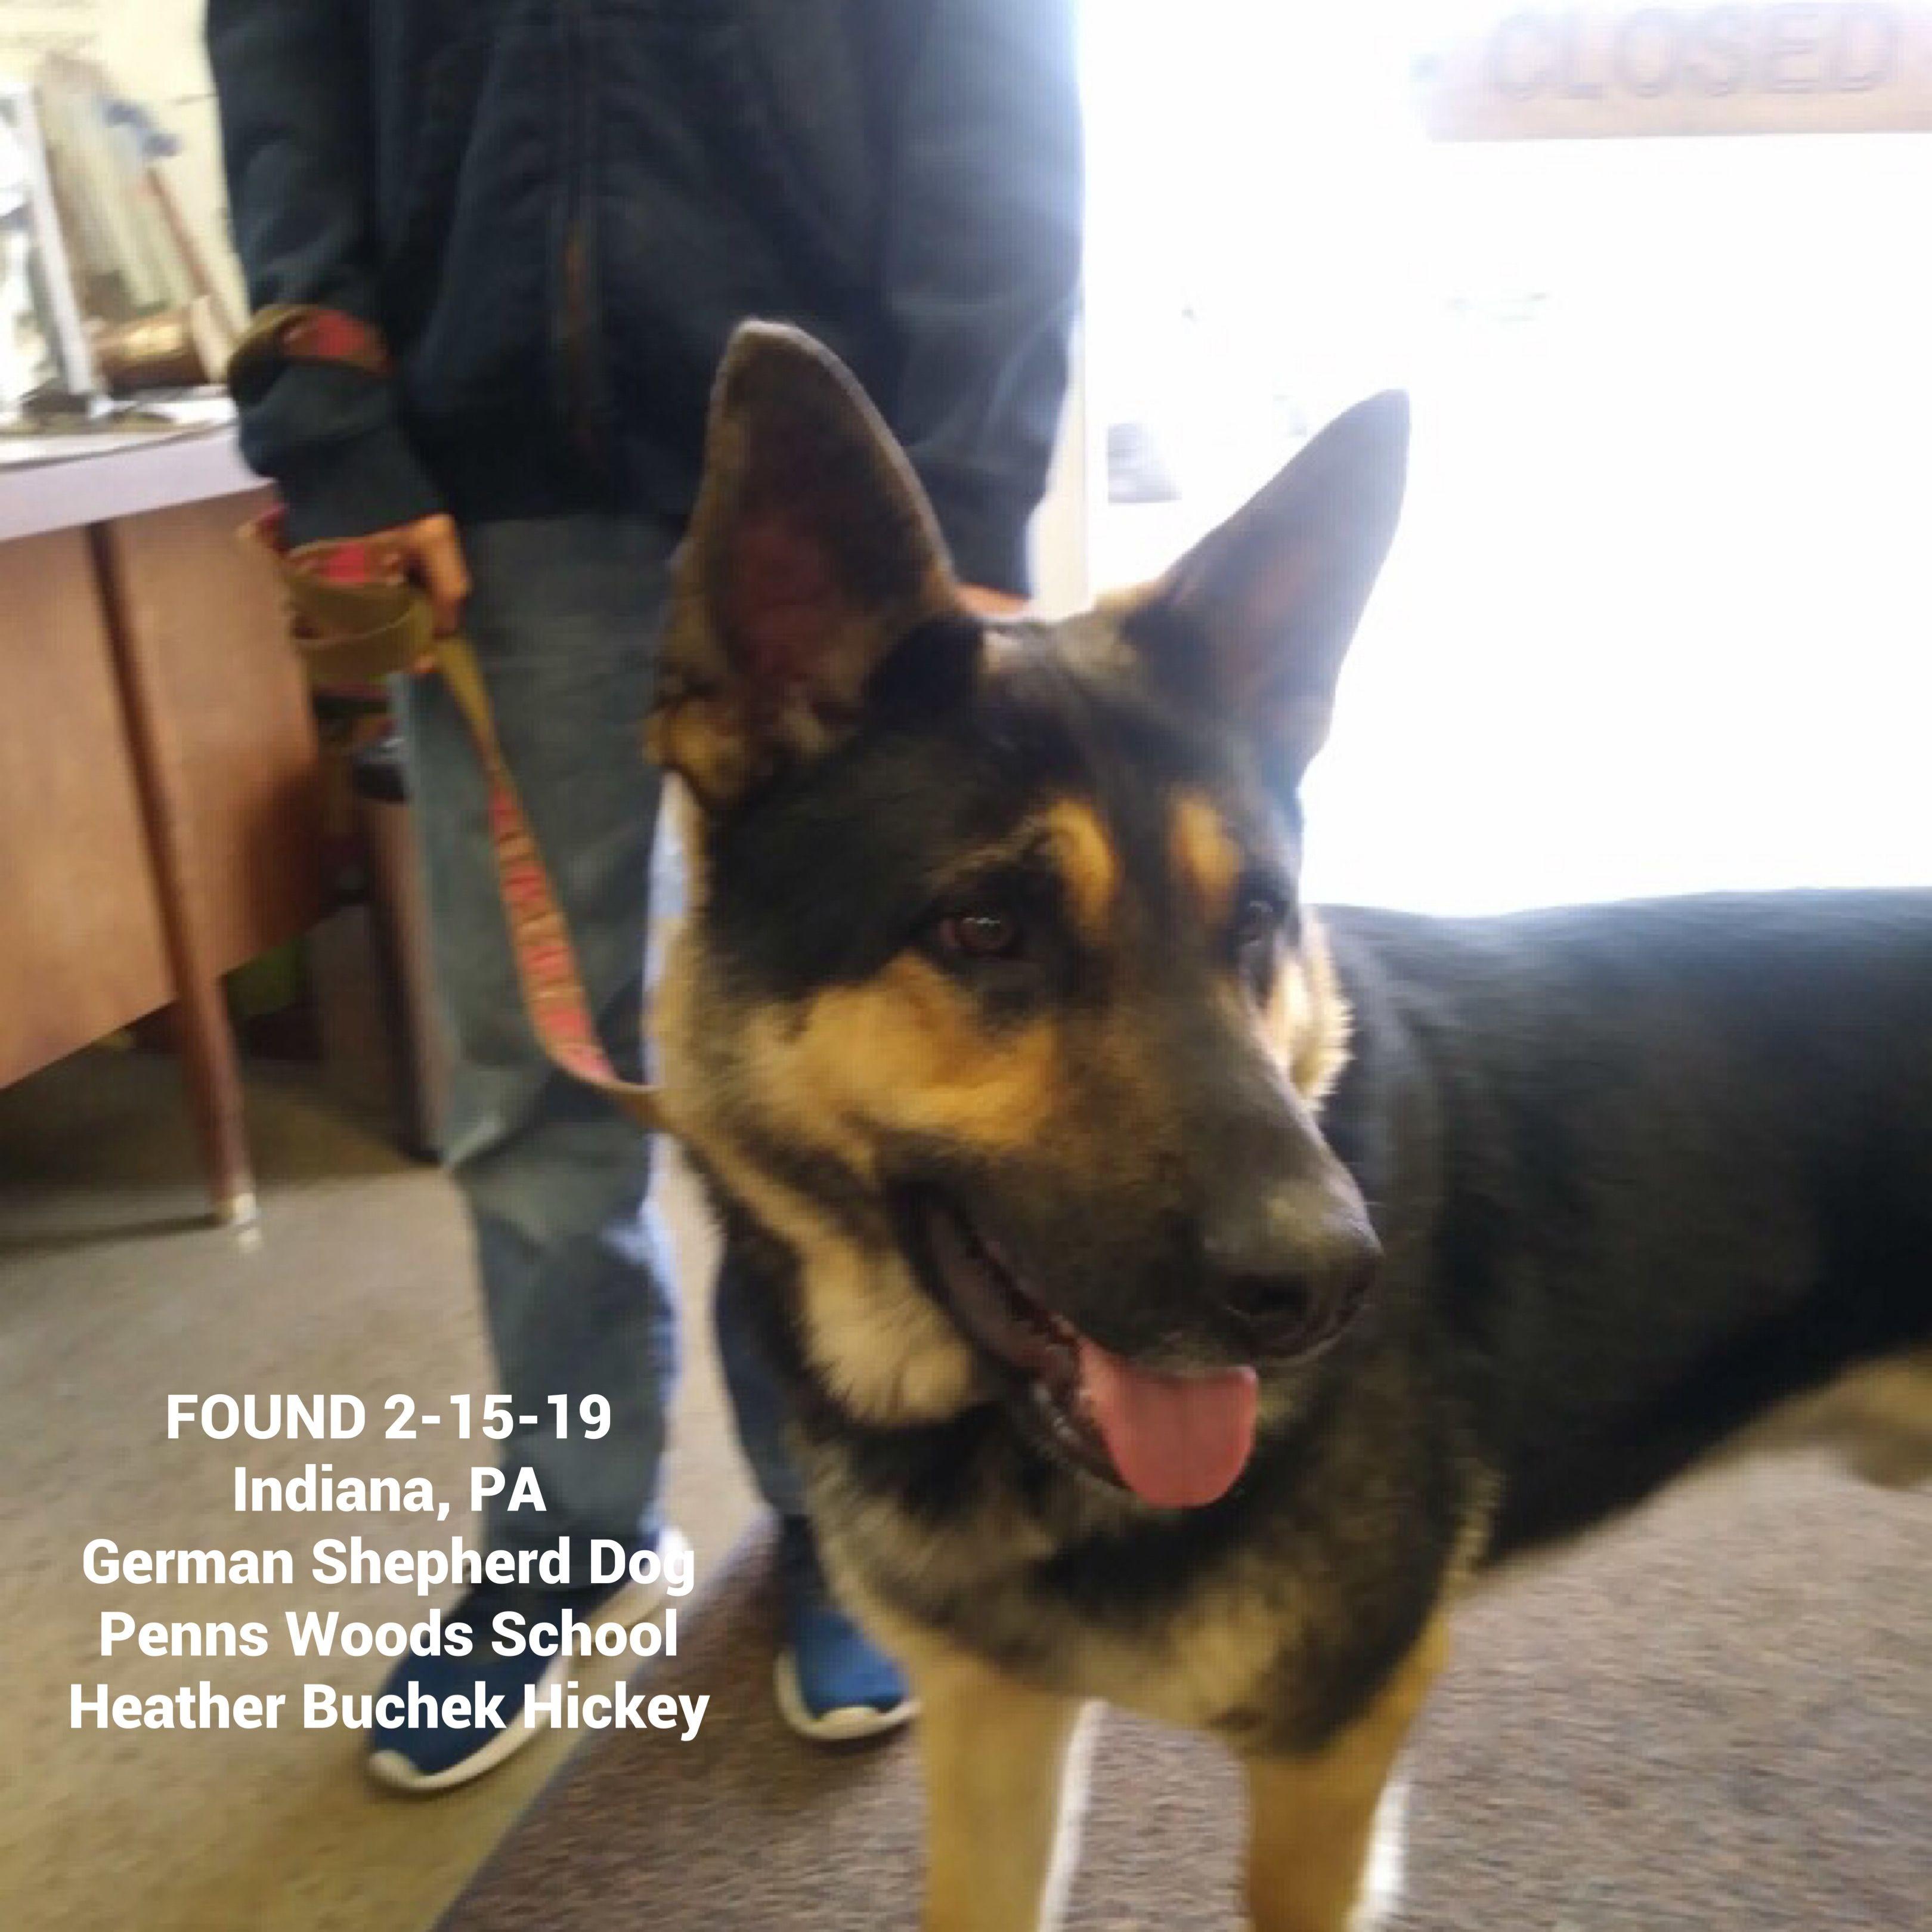 FOUNDdog 21519 Indiana, PA GermanShepherdDog Penns